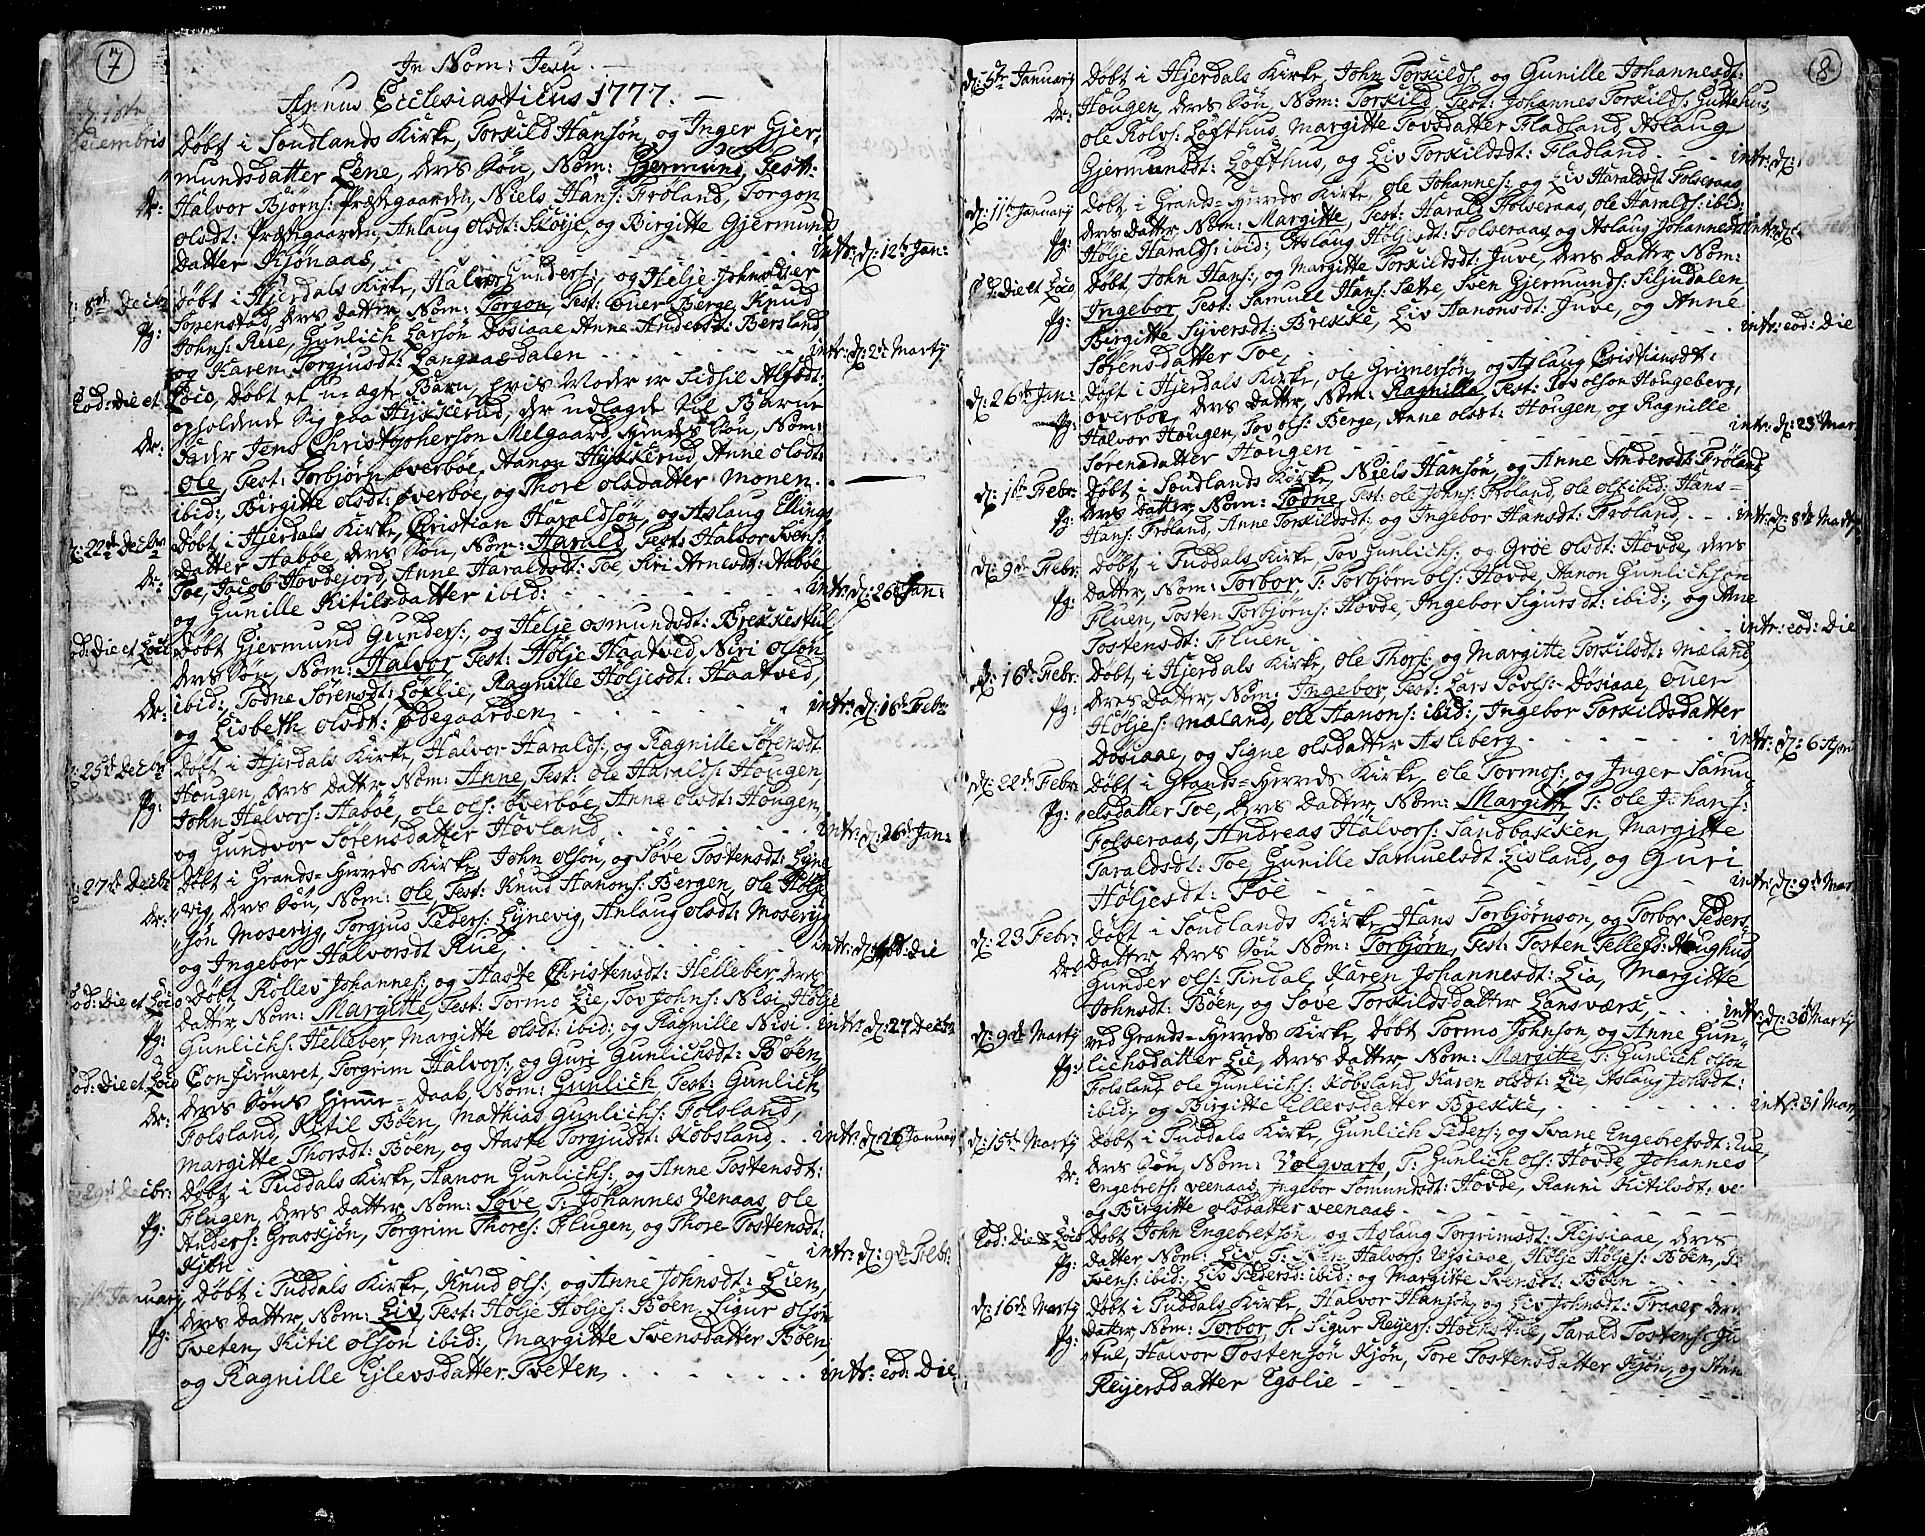 SAKO, Hjartdal kirkebøker, F/Fa/L0005: Ministerialbok nr. I 5, 1776-1801, s. 7-8